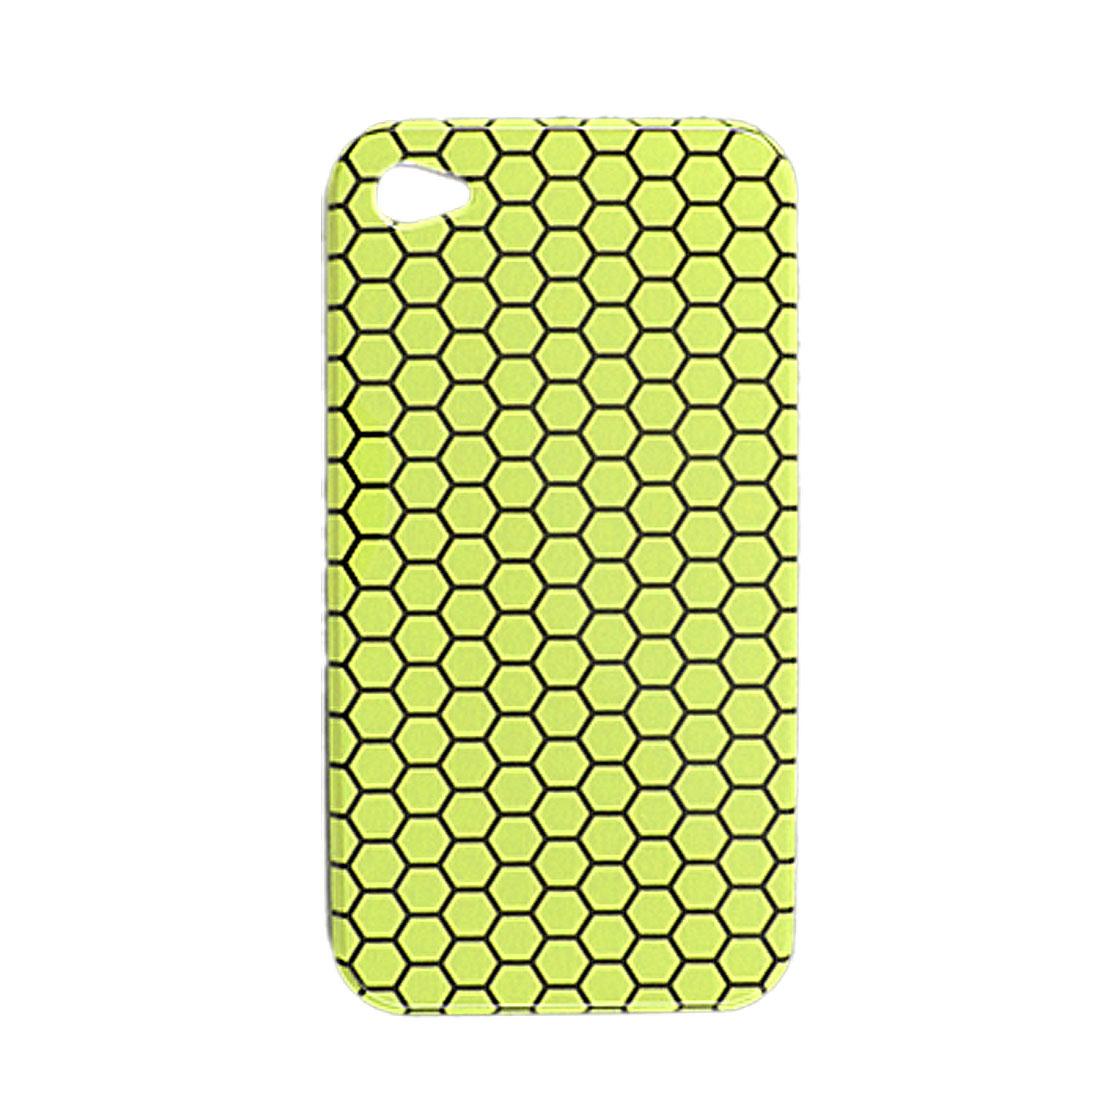 Black Hexagonal Yellow Back Case for Apple iPhone 4 4G